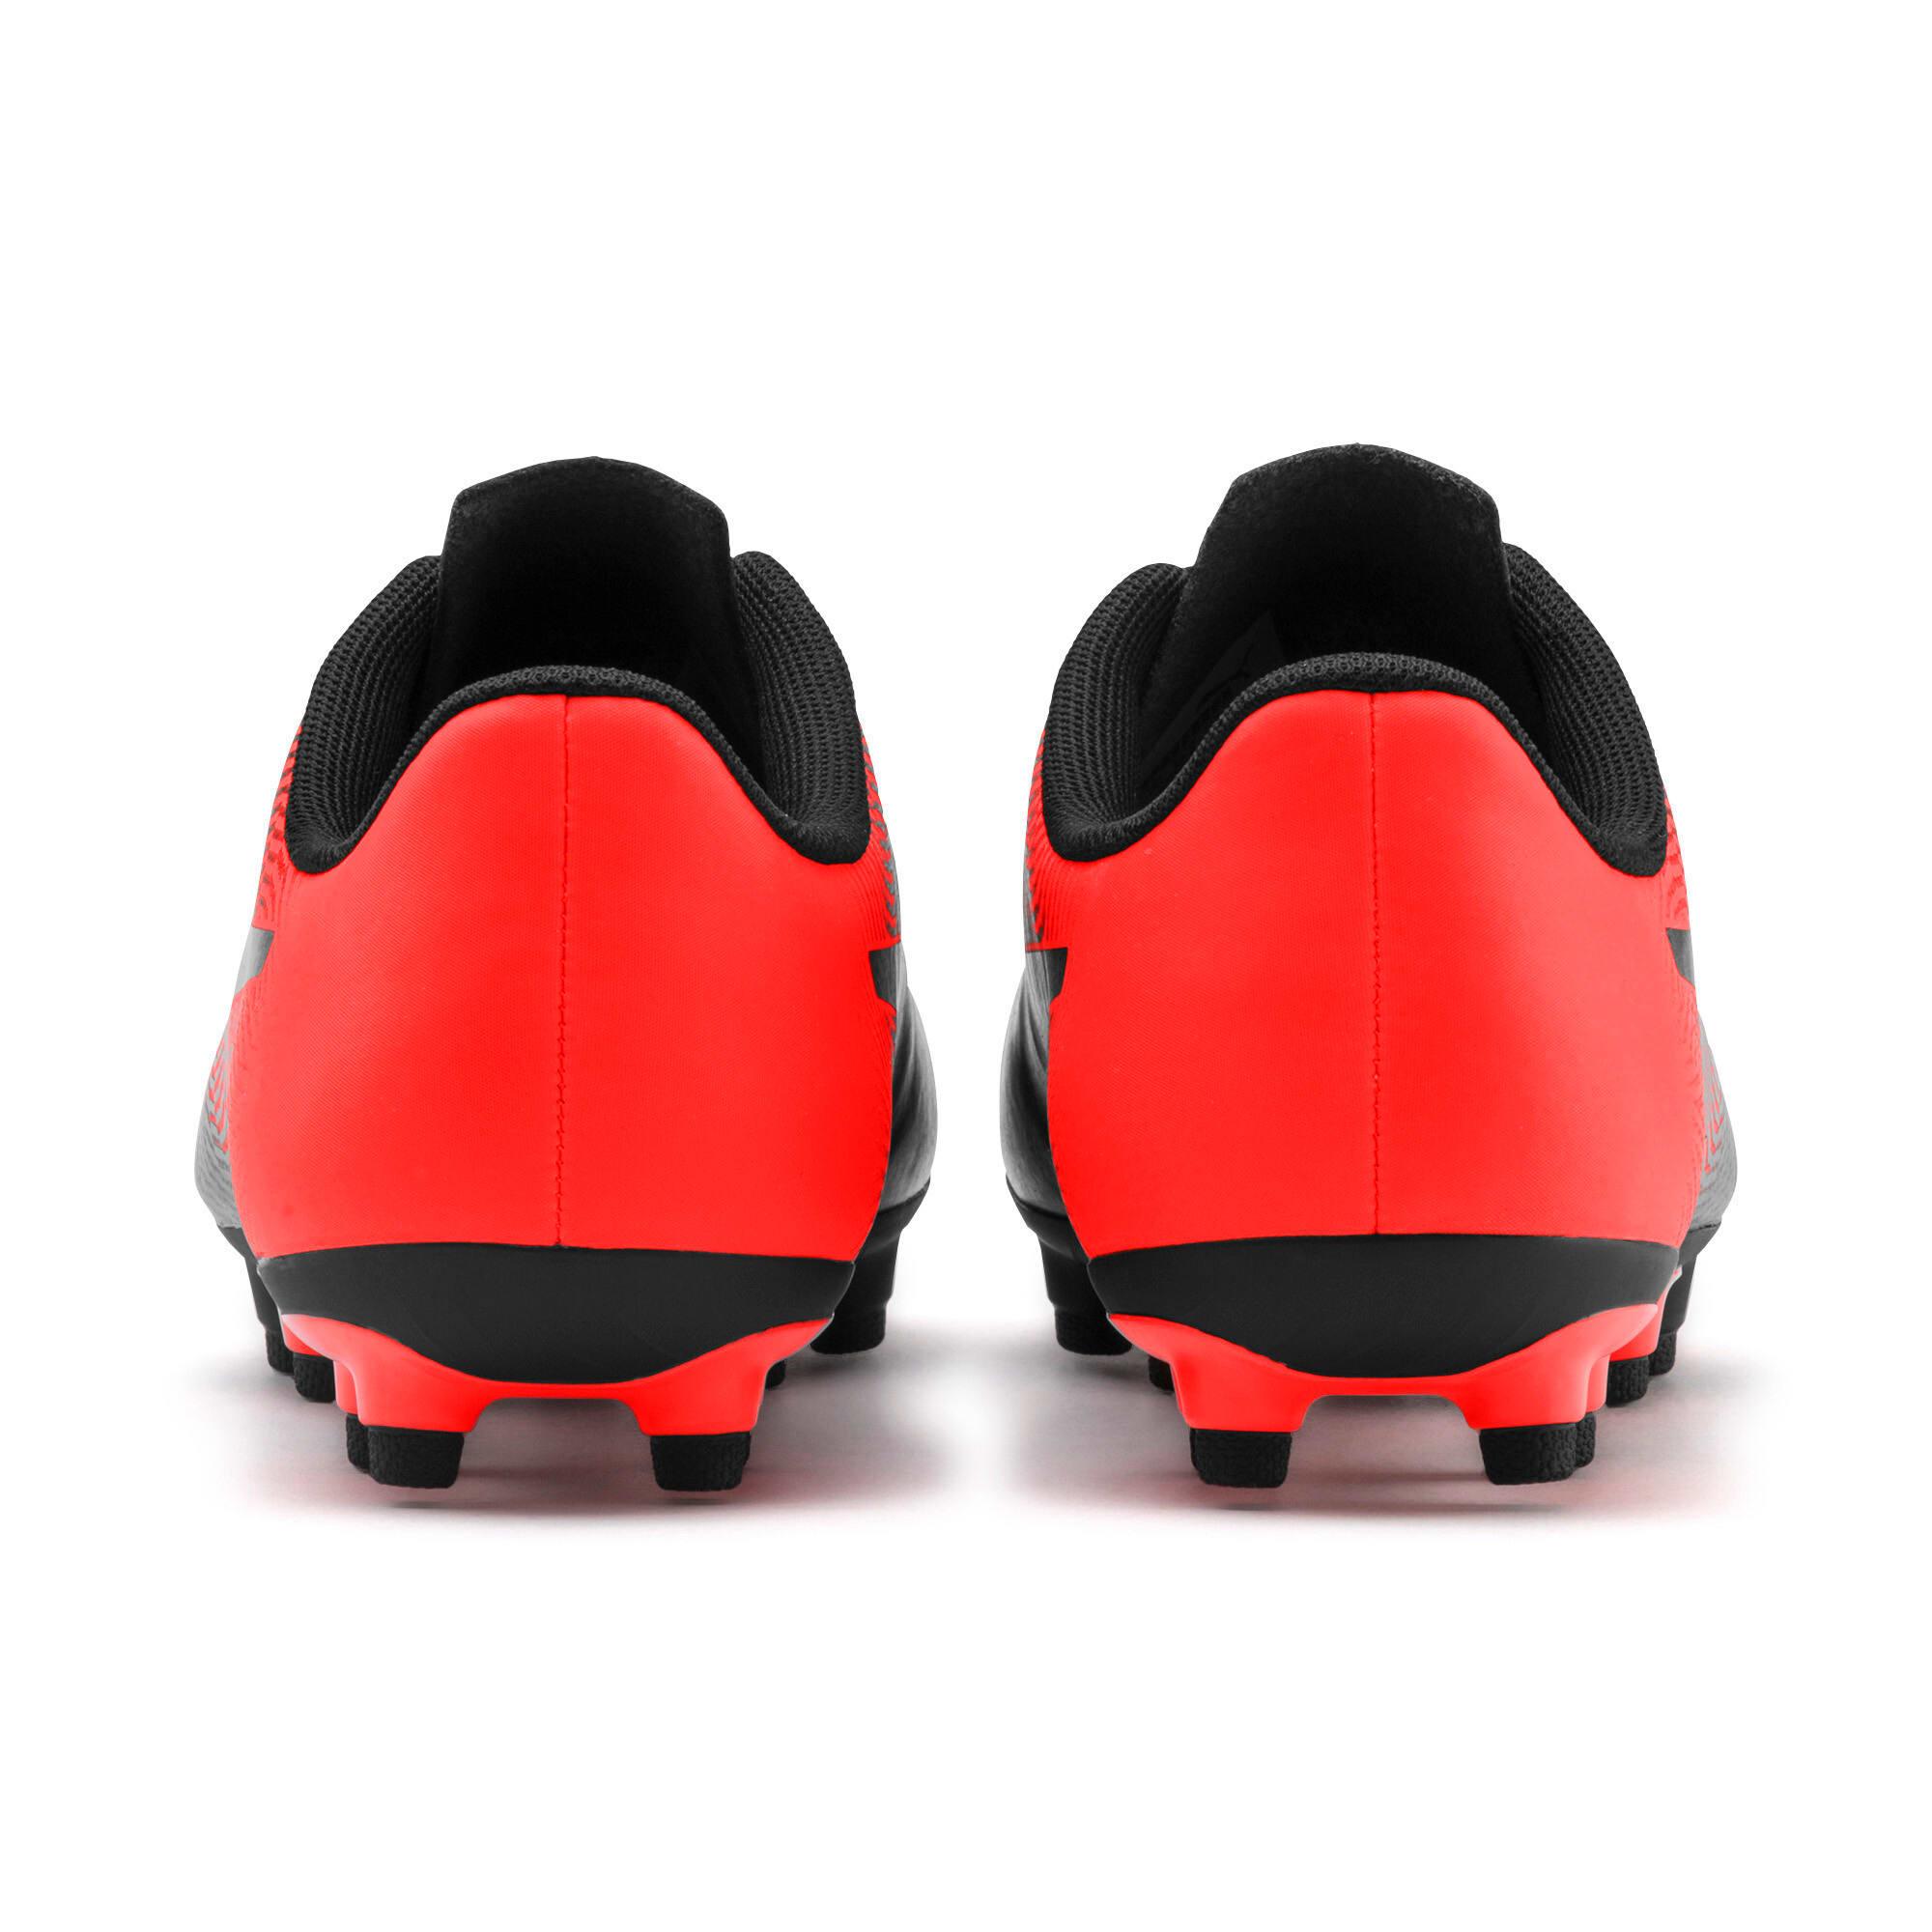 Thumbnail 4 of PUMA Spirit II FG Youth Football Boots, Puma Black-Nrgy Red, medium-IND